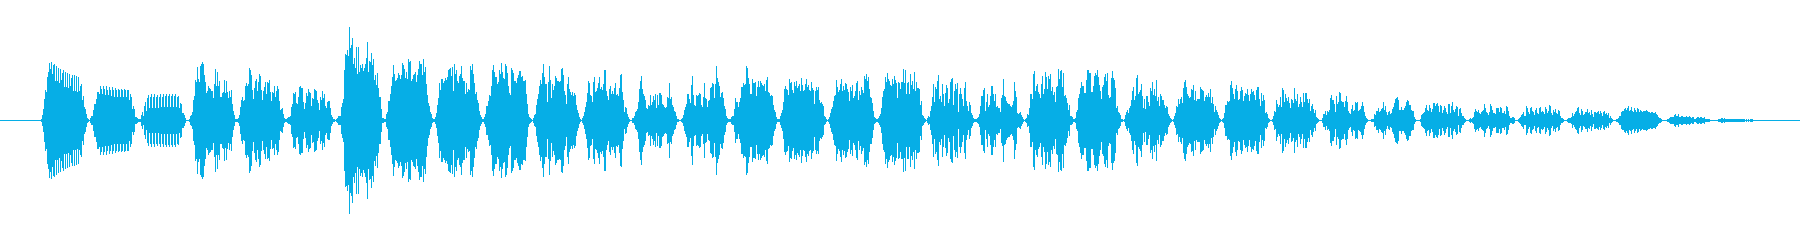 KANT近未来アラームサウンド242の再生済みの波形